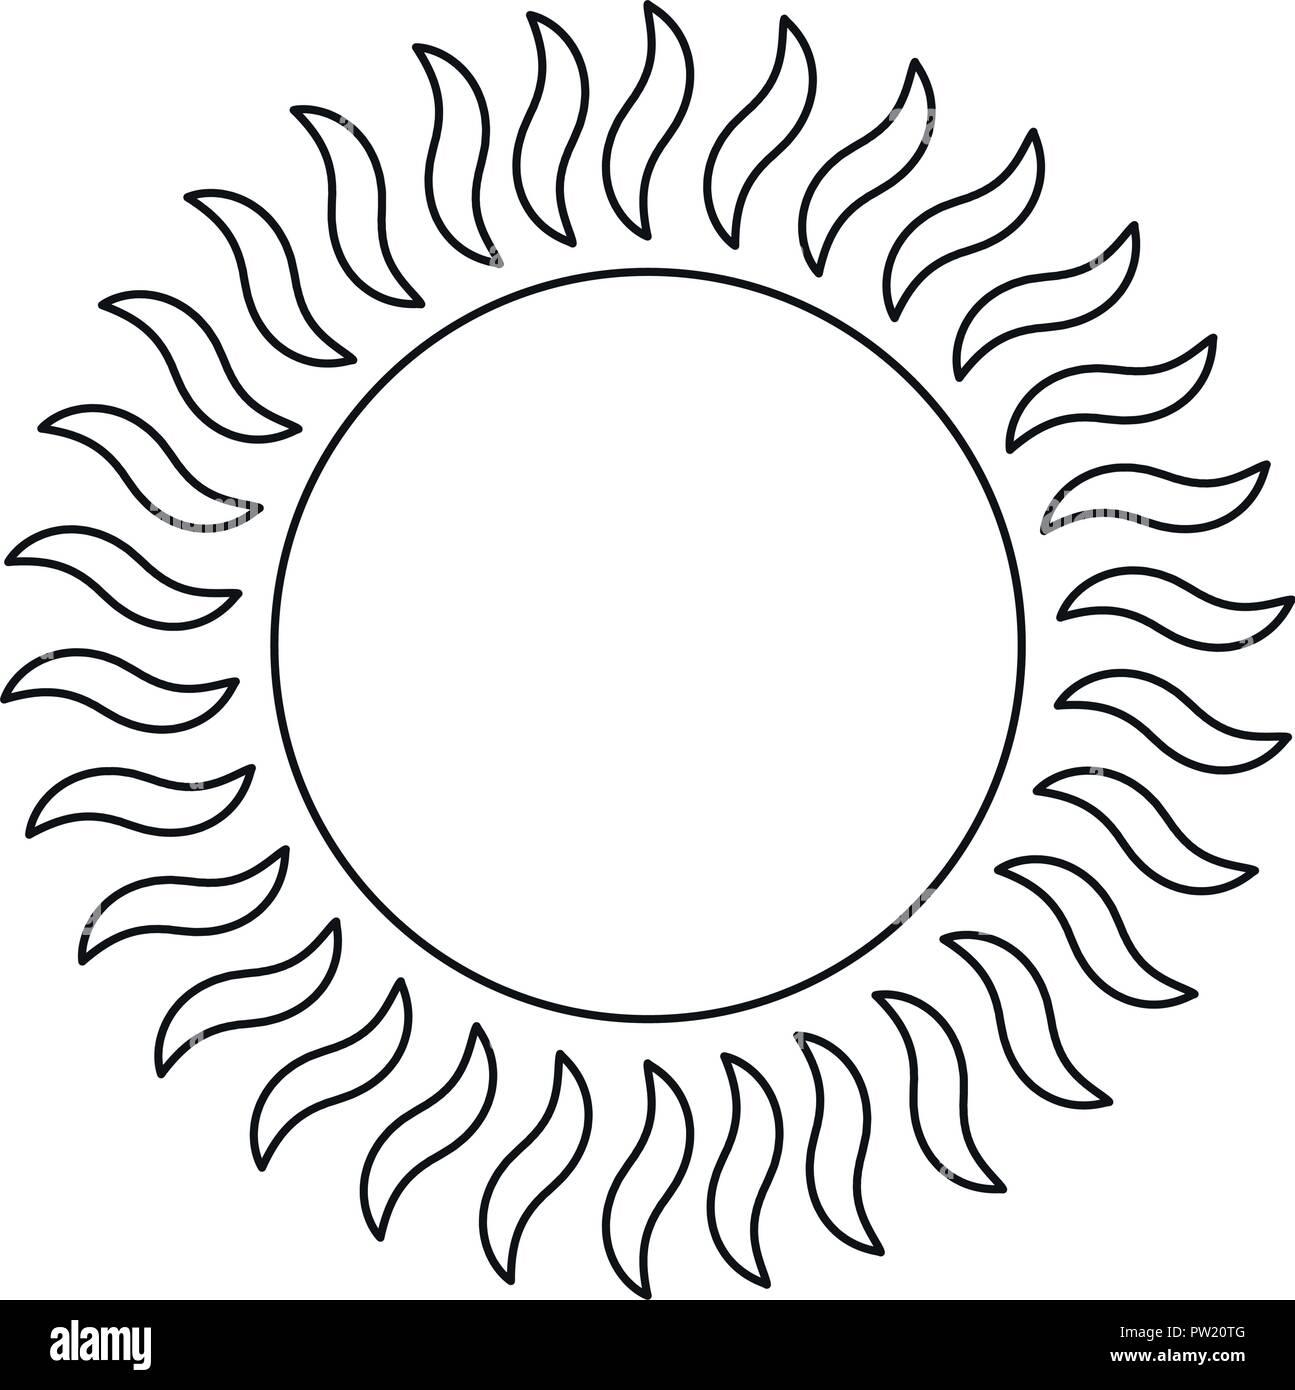 glowing sun summer hot image vector illustration - Stock Vector